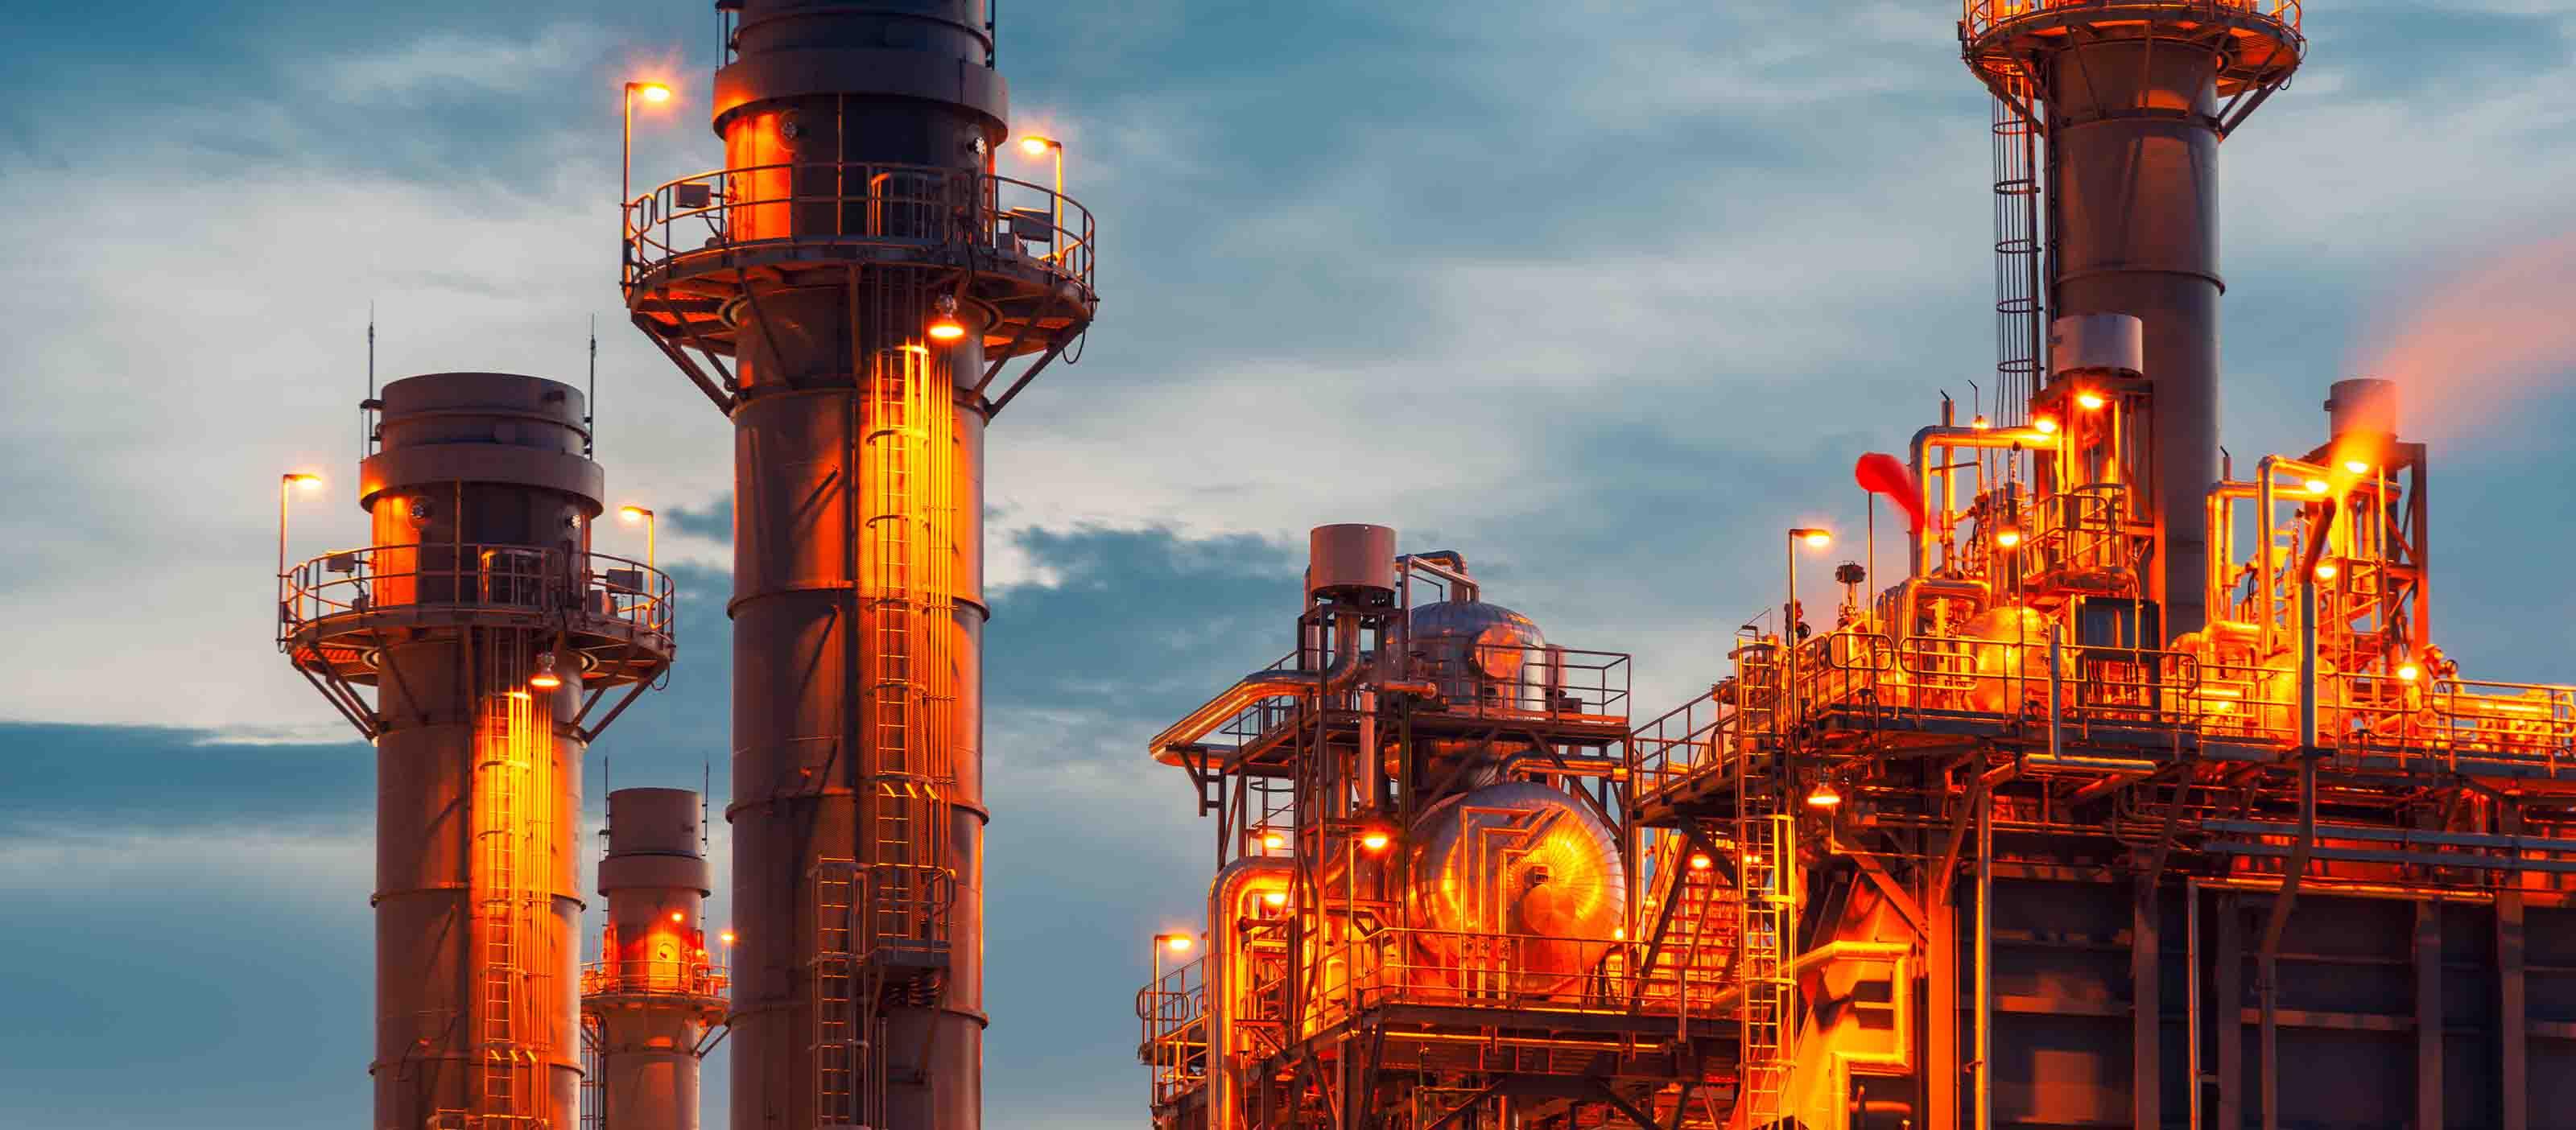 Asset Performance Management (APM) software for Power Generators | GE Digital